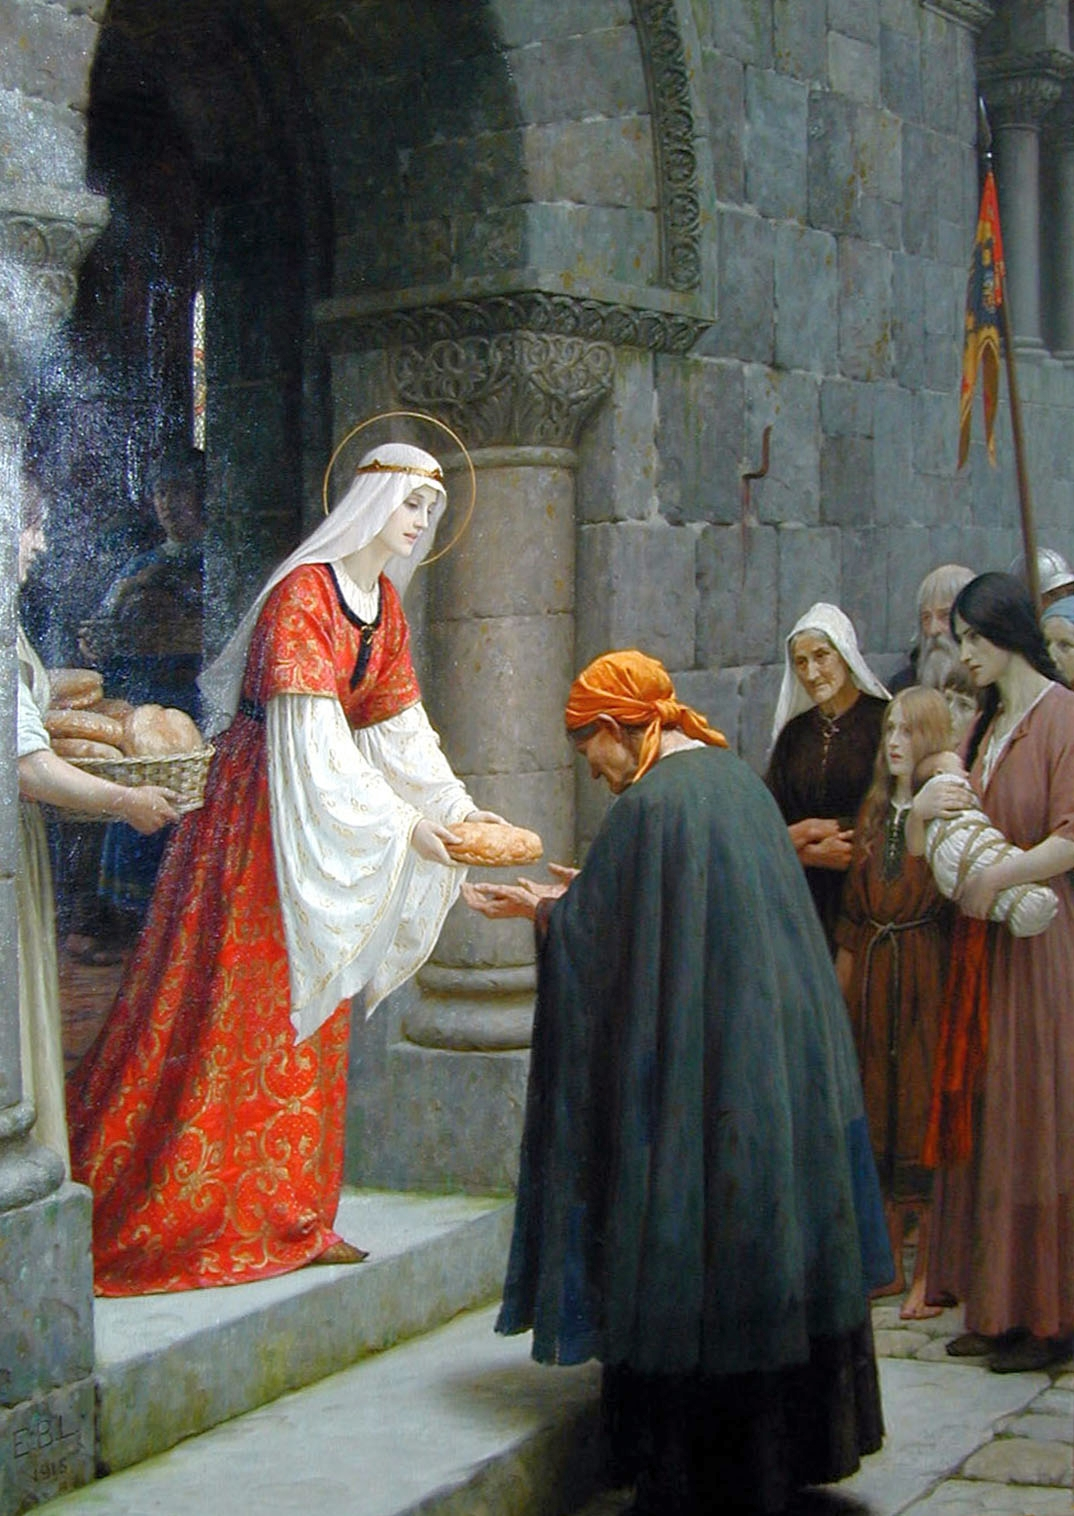 NOVEMBER 17 - ST ELIZABETH OF HUNGARY --- Santa Eliżabetta ta' l-Ungerija - 17 ta' Novembru